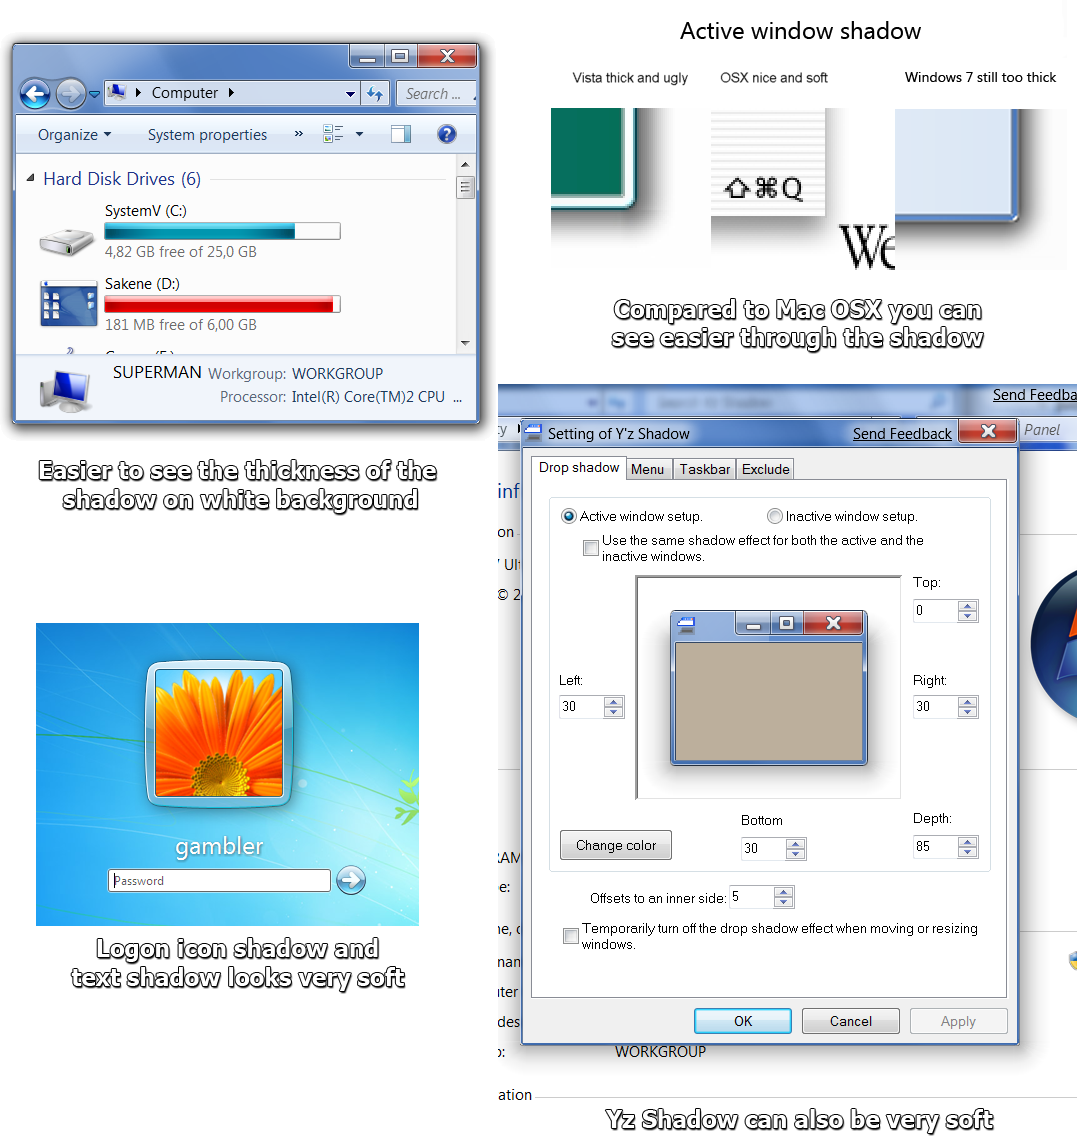 Adobe photoshop cc crack amtlib dll. free download call of duty 2 crack fil